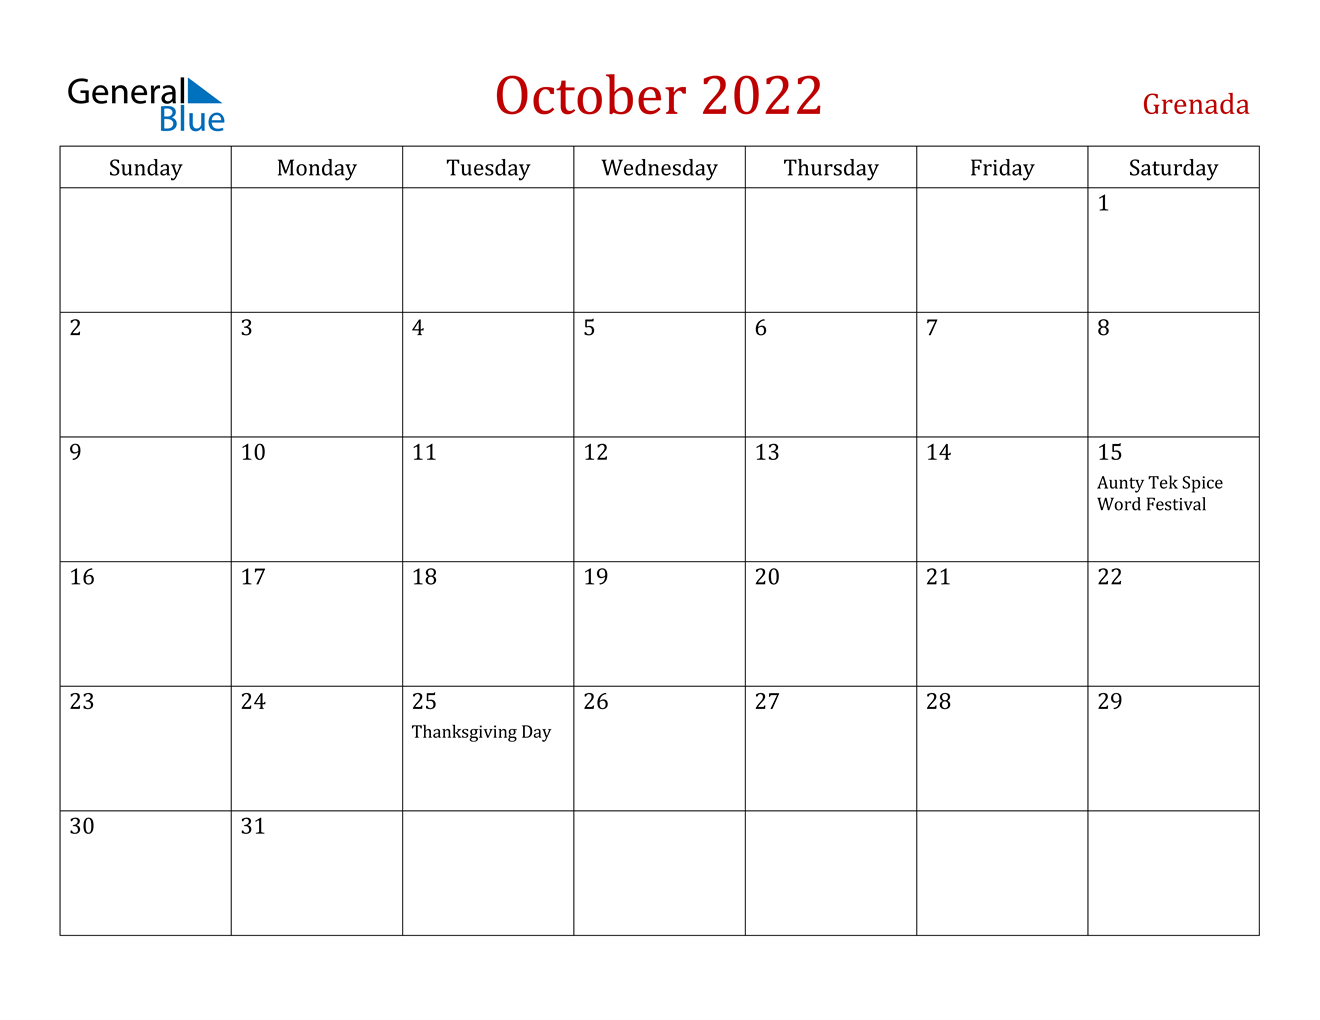 Grenada October 2022 Calendar With Holidays within October 2022 Planner Calendar